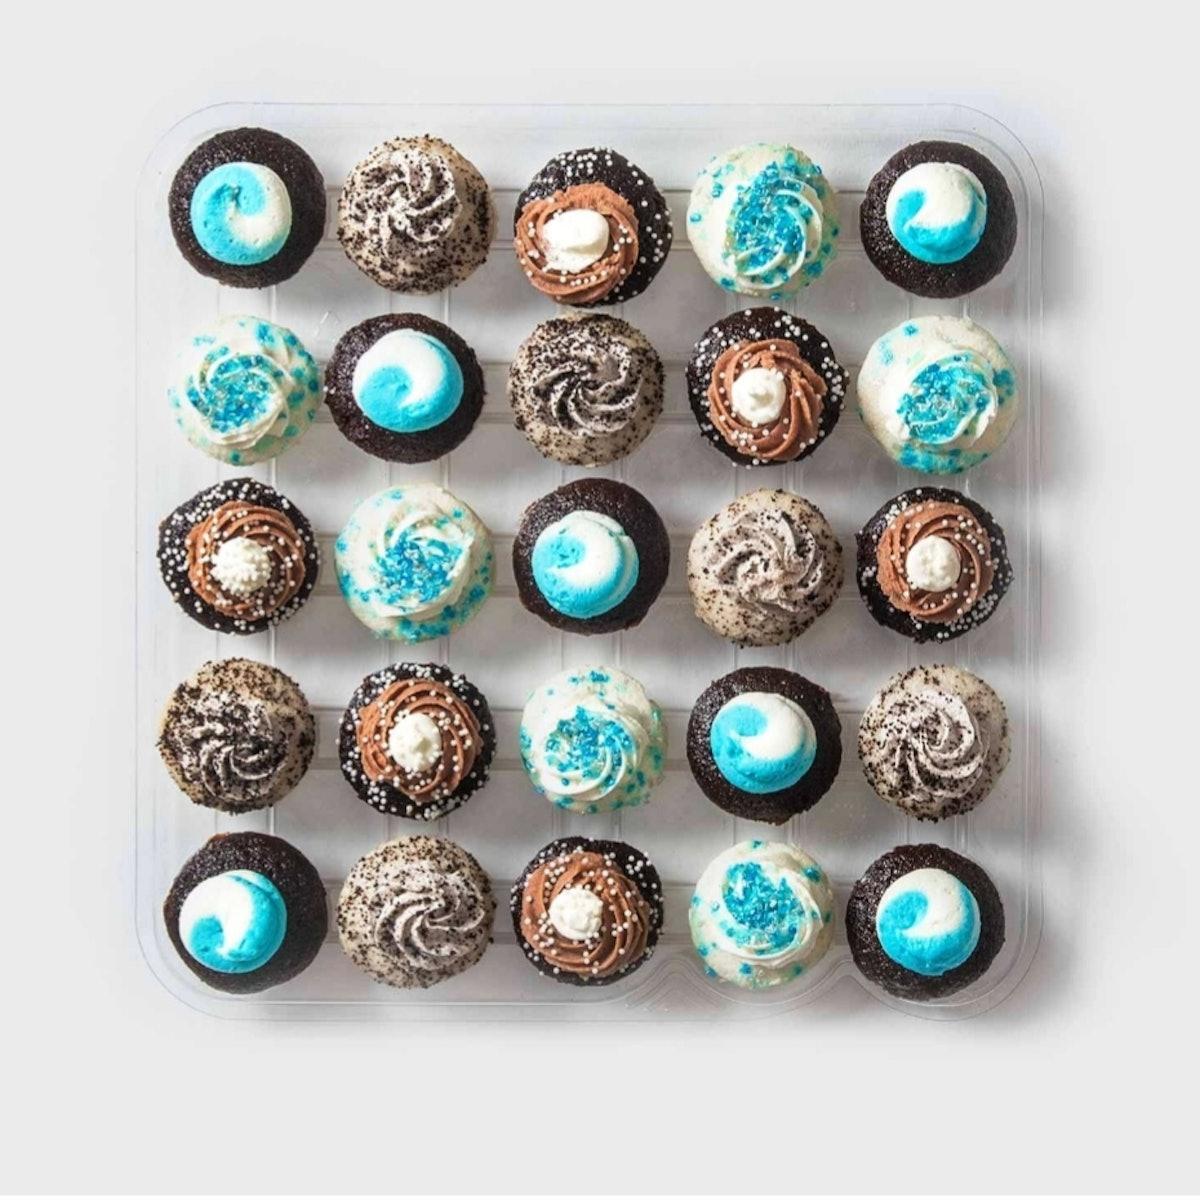 Festival of Bites Cupcakes 25-Pack